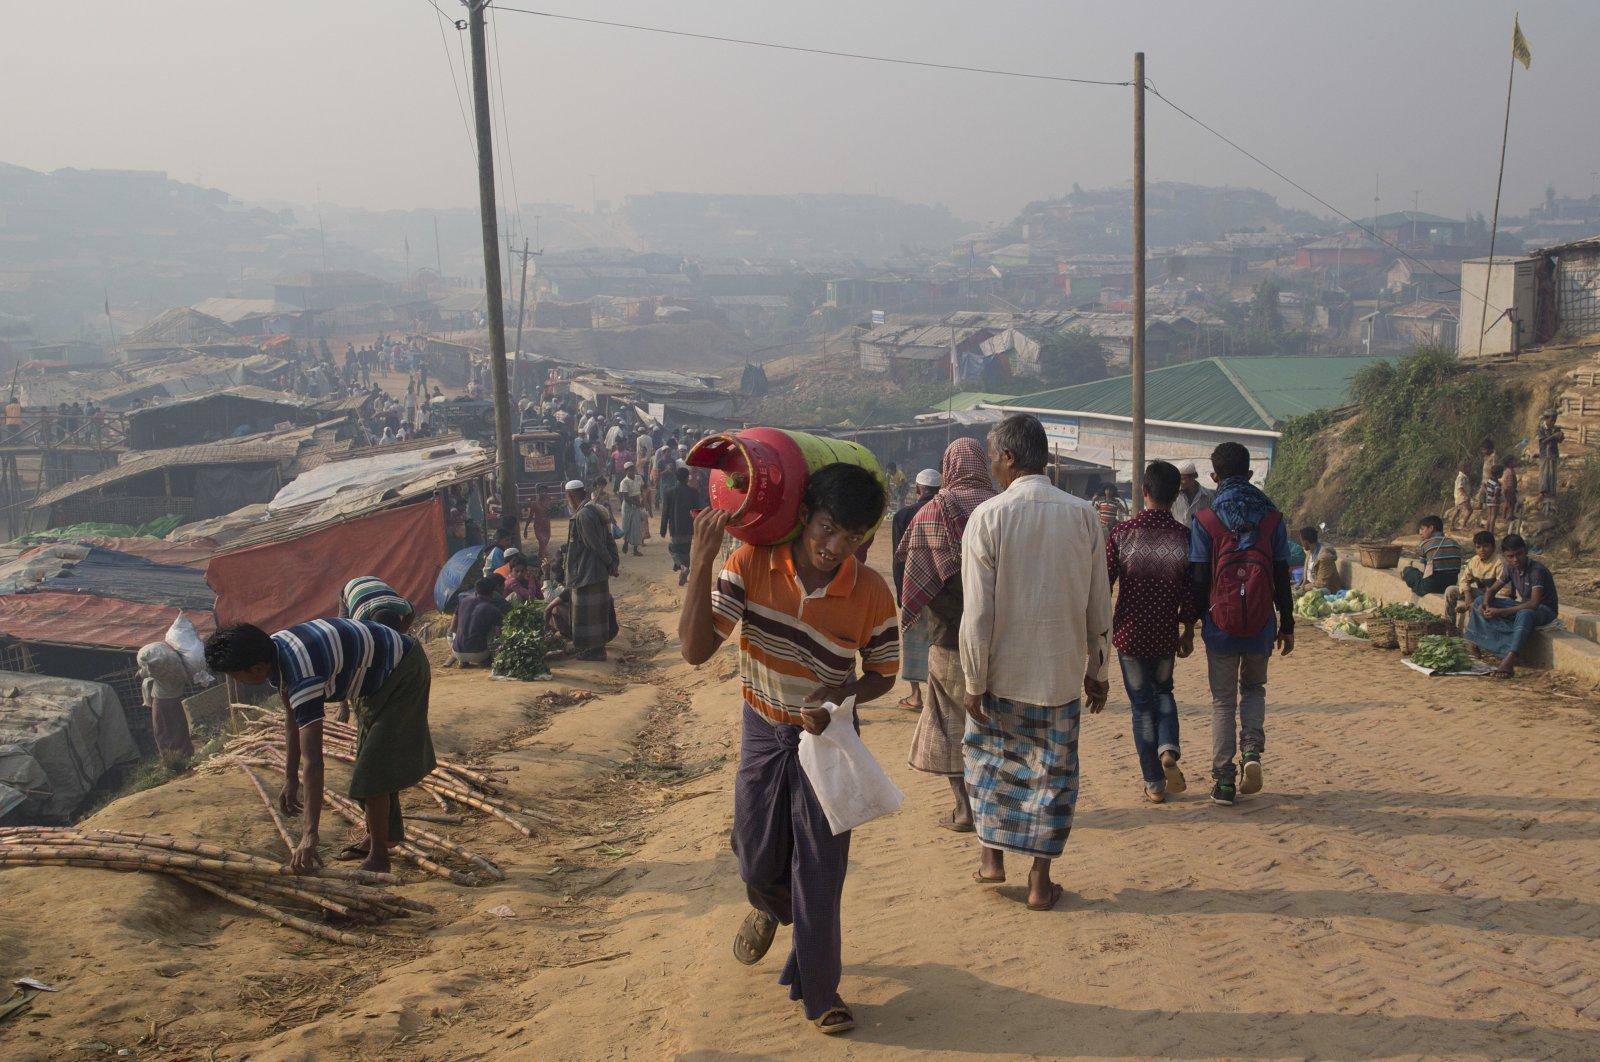 A Rohingya refugee walks carrying a cooking gas cylinder inside Balukhali refugee camp near Cox's Bazar in Bangladesh, Nov. 17, 2018. (AP Photo)